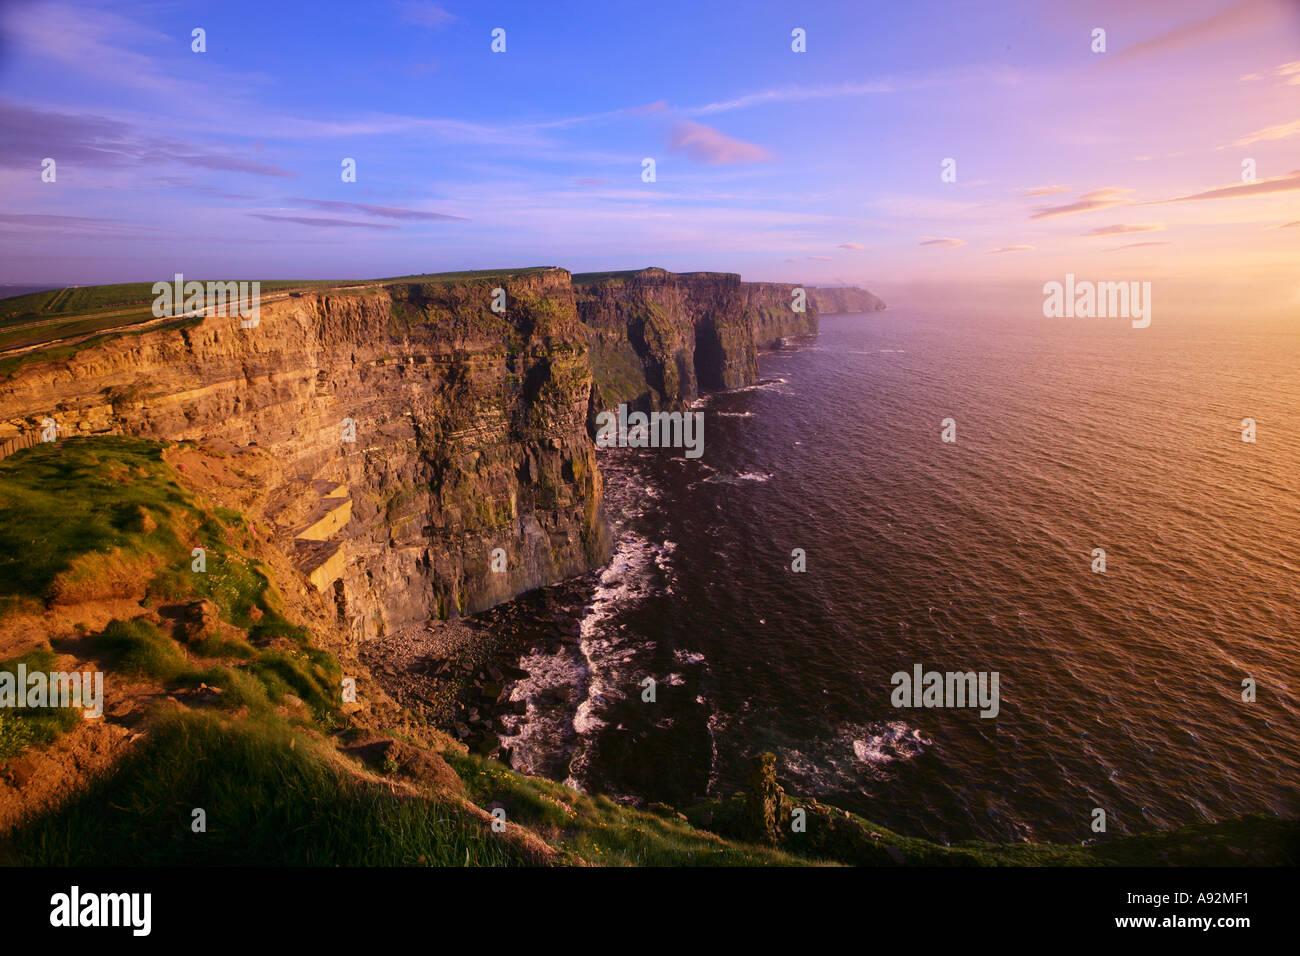 Acantilados de Moher County Clare, Irlanda Imagen De Stock